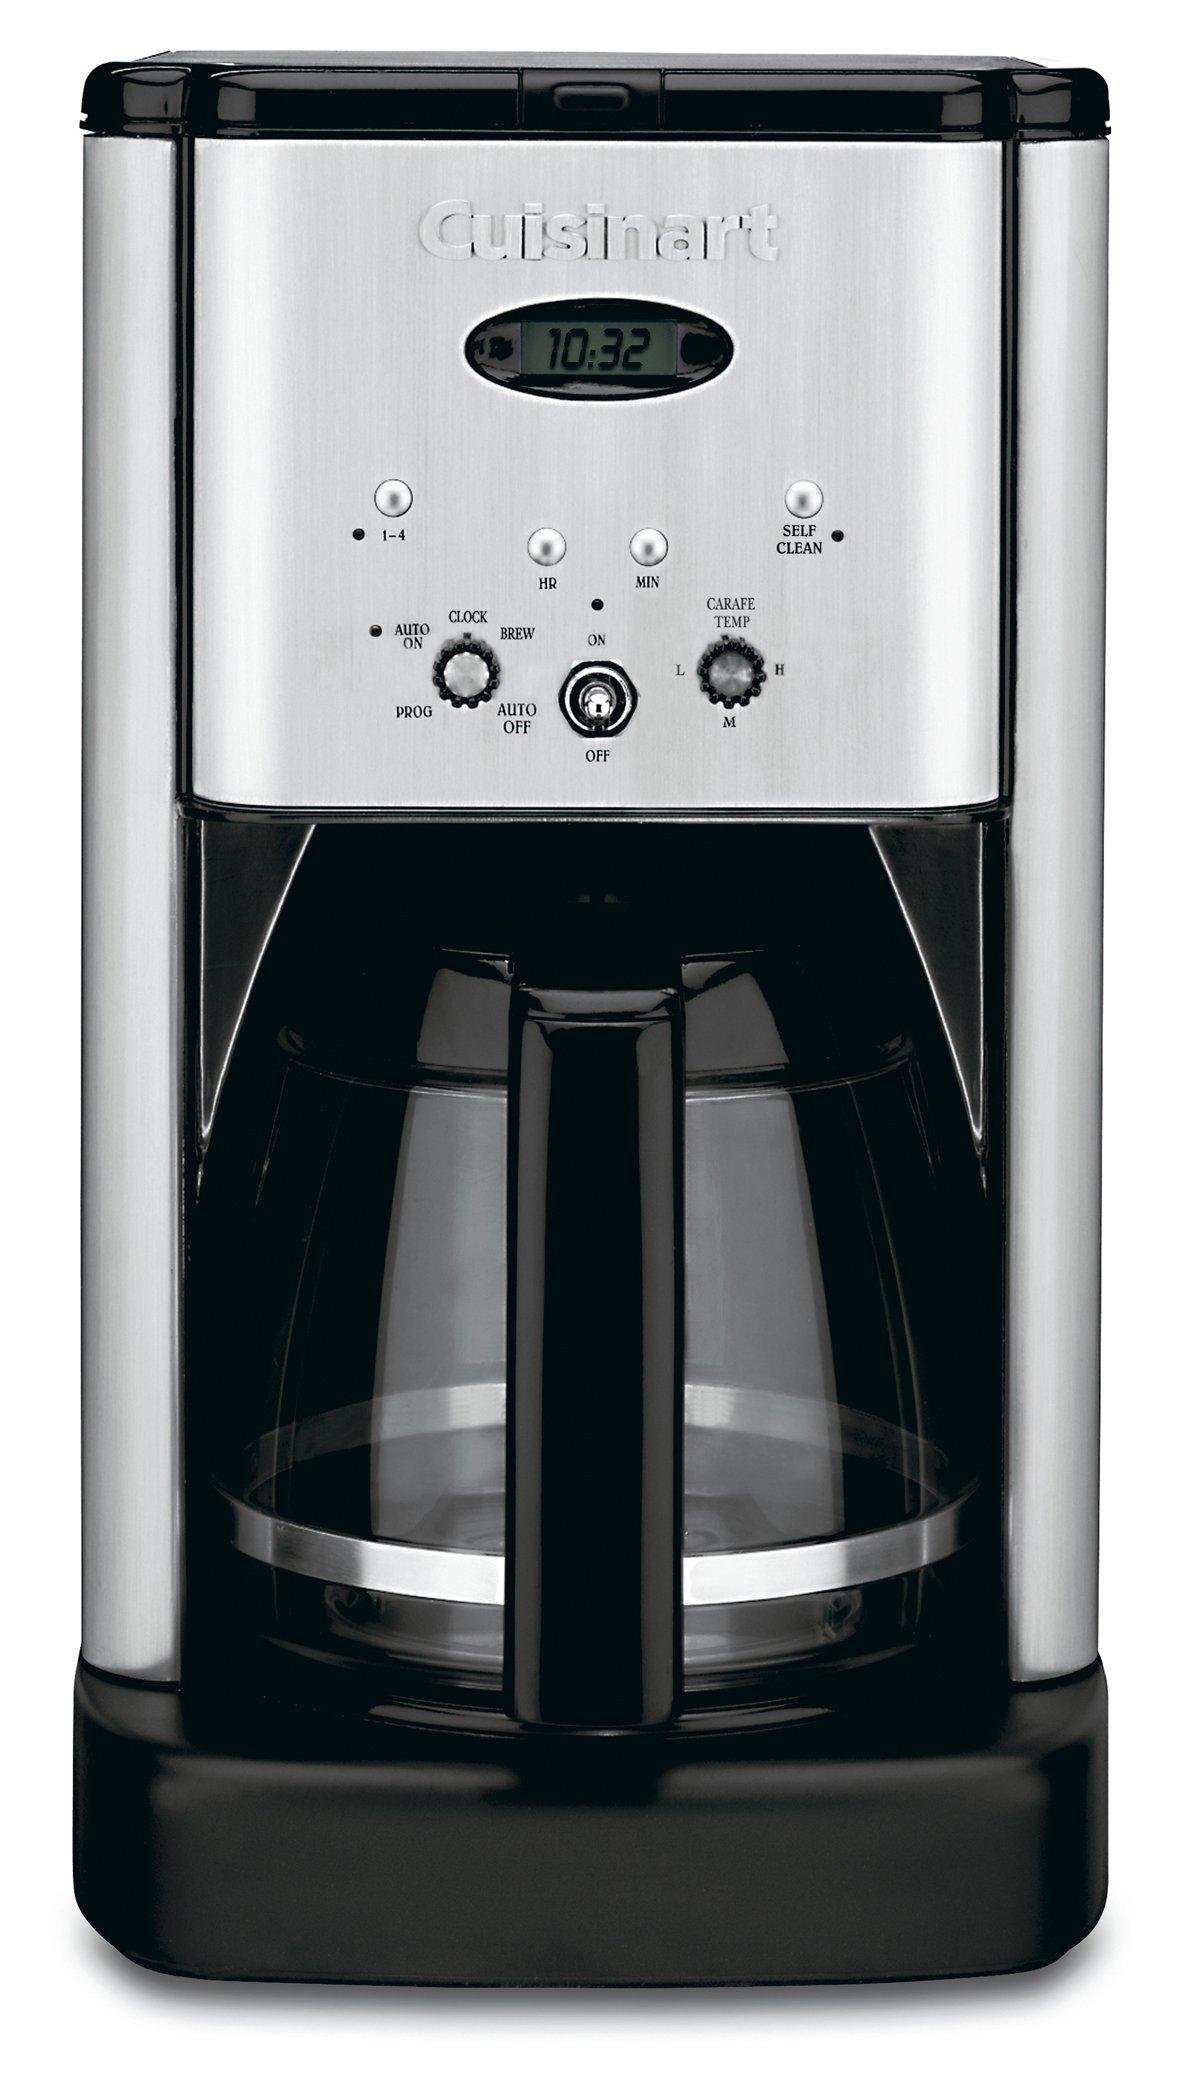 Cuisinart DCC 1200 Central Programmable Coffeemaker